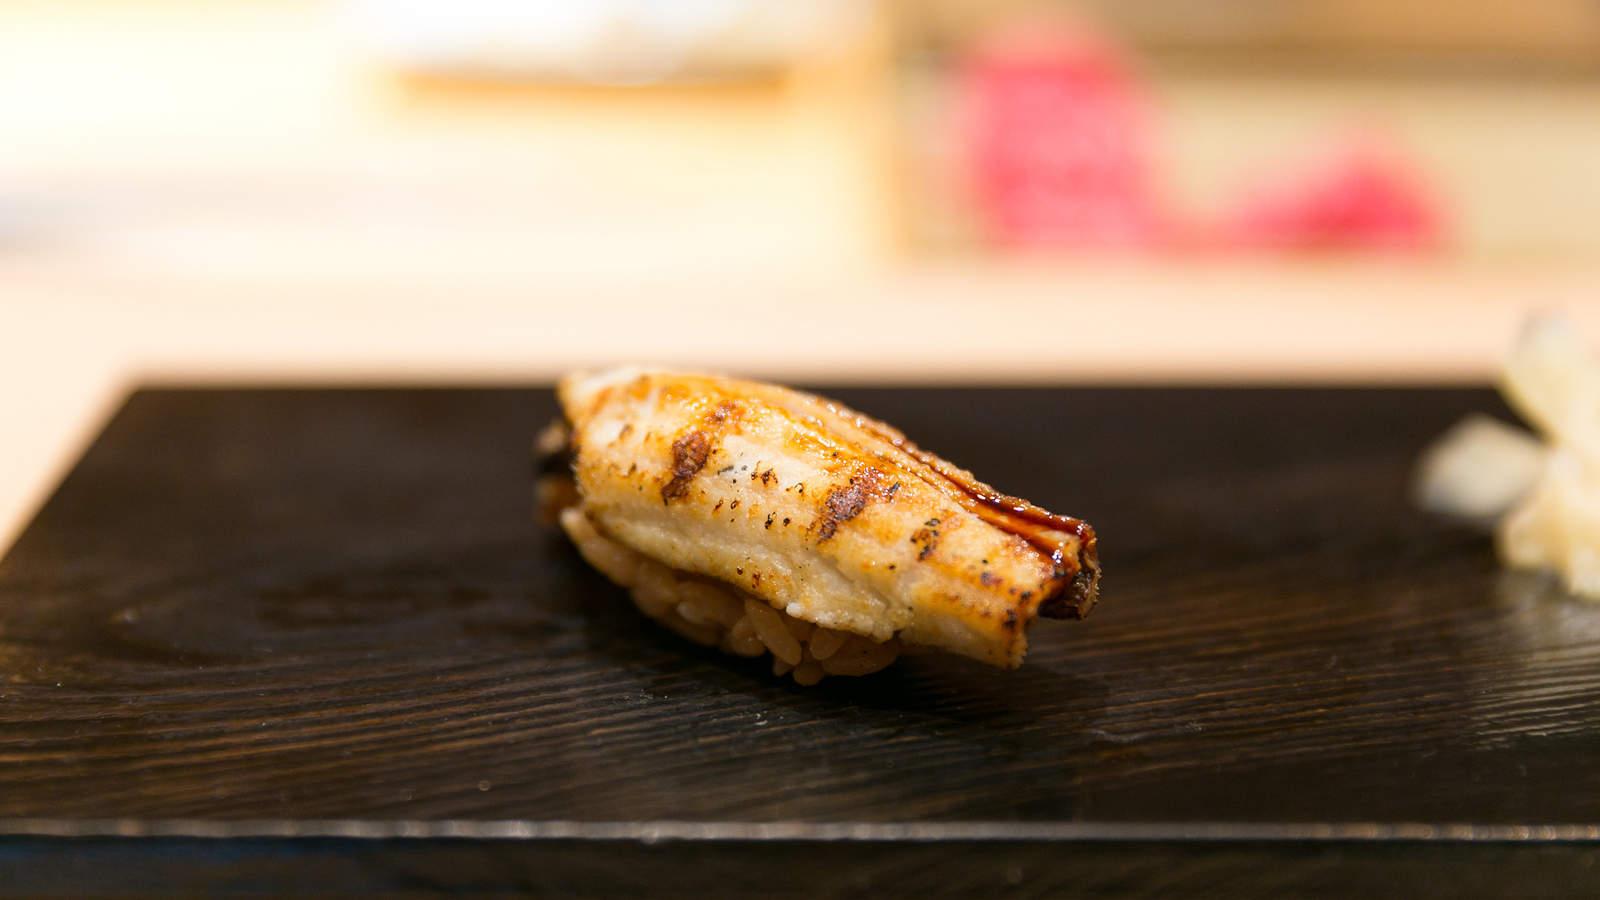 Anago Sushi, 穴子 (Saltwater Eel)